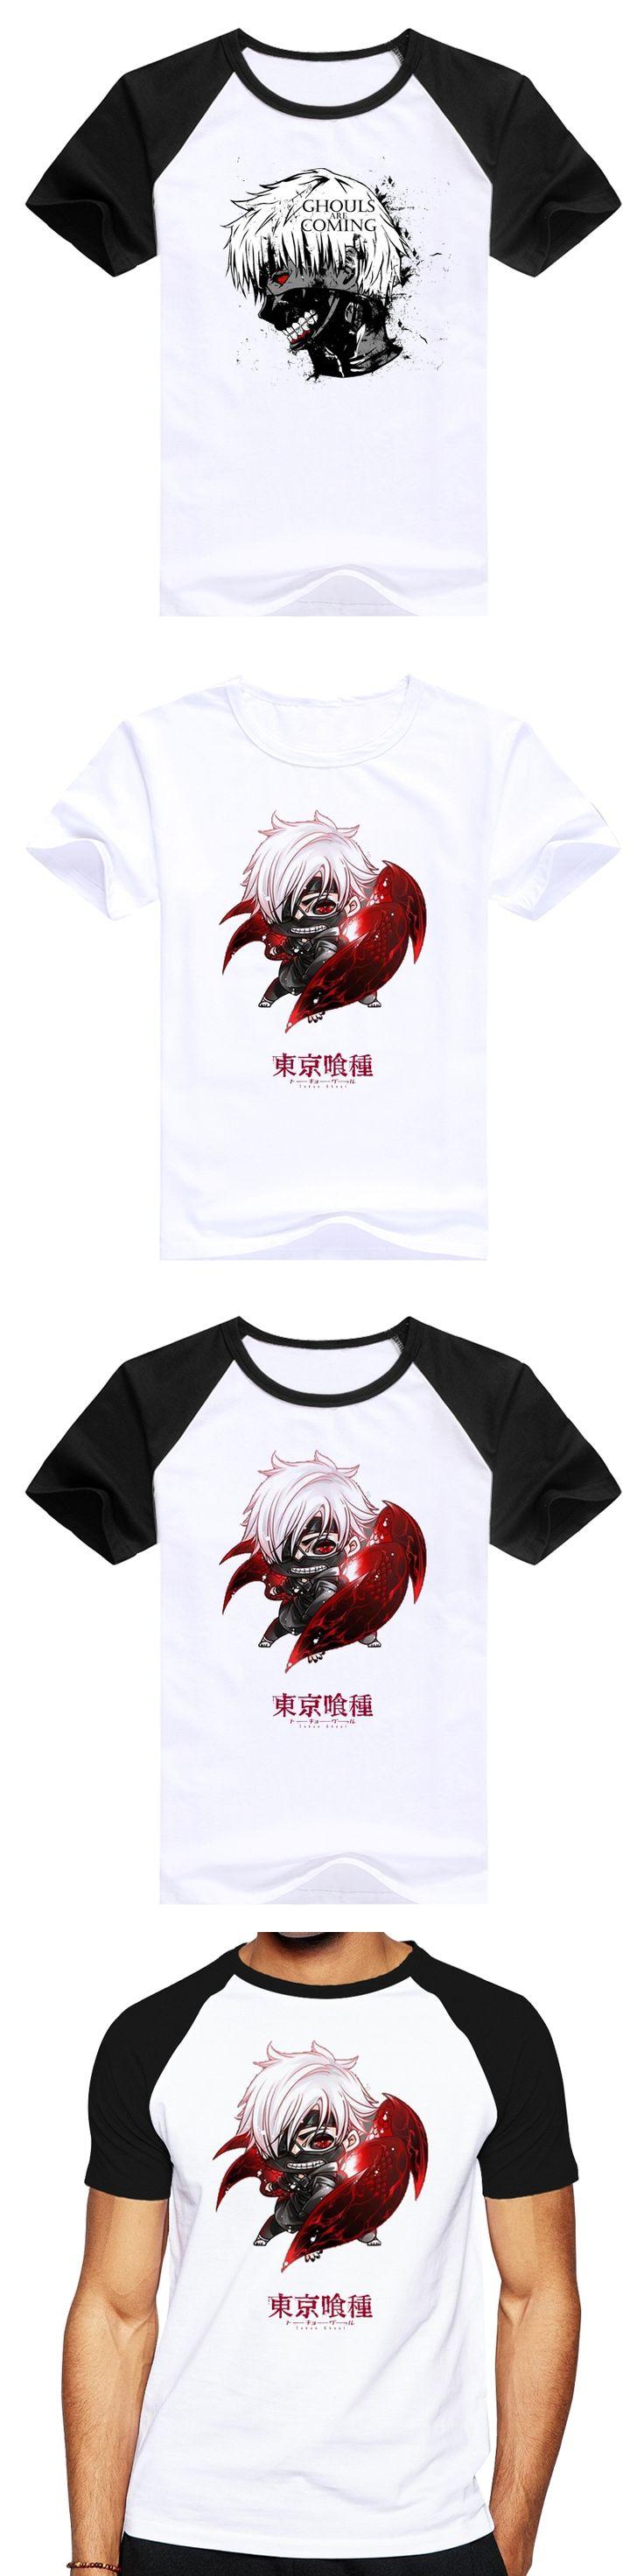 Men Summer hip hop Short Sleeve manga Tokyo Ghoul T-shirts Animation Cartoon Sasuke Ninja Print T Shirts Fashion Shirts Design